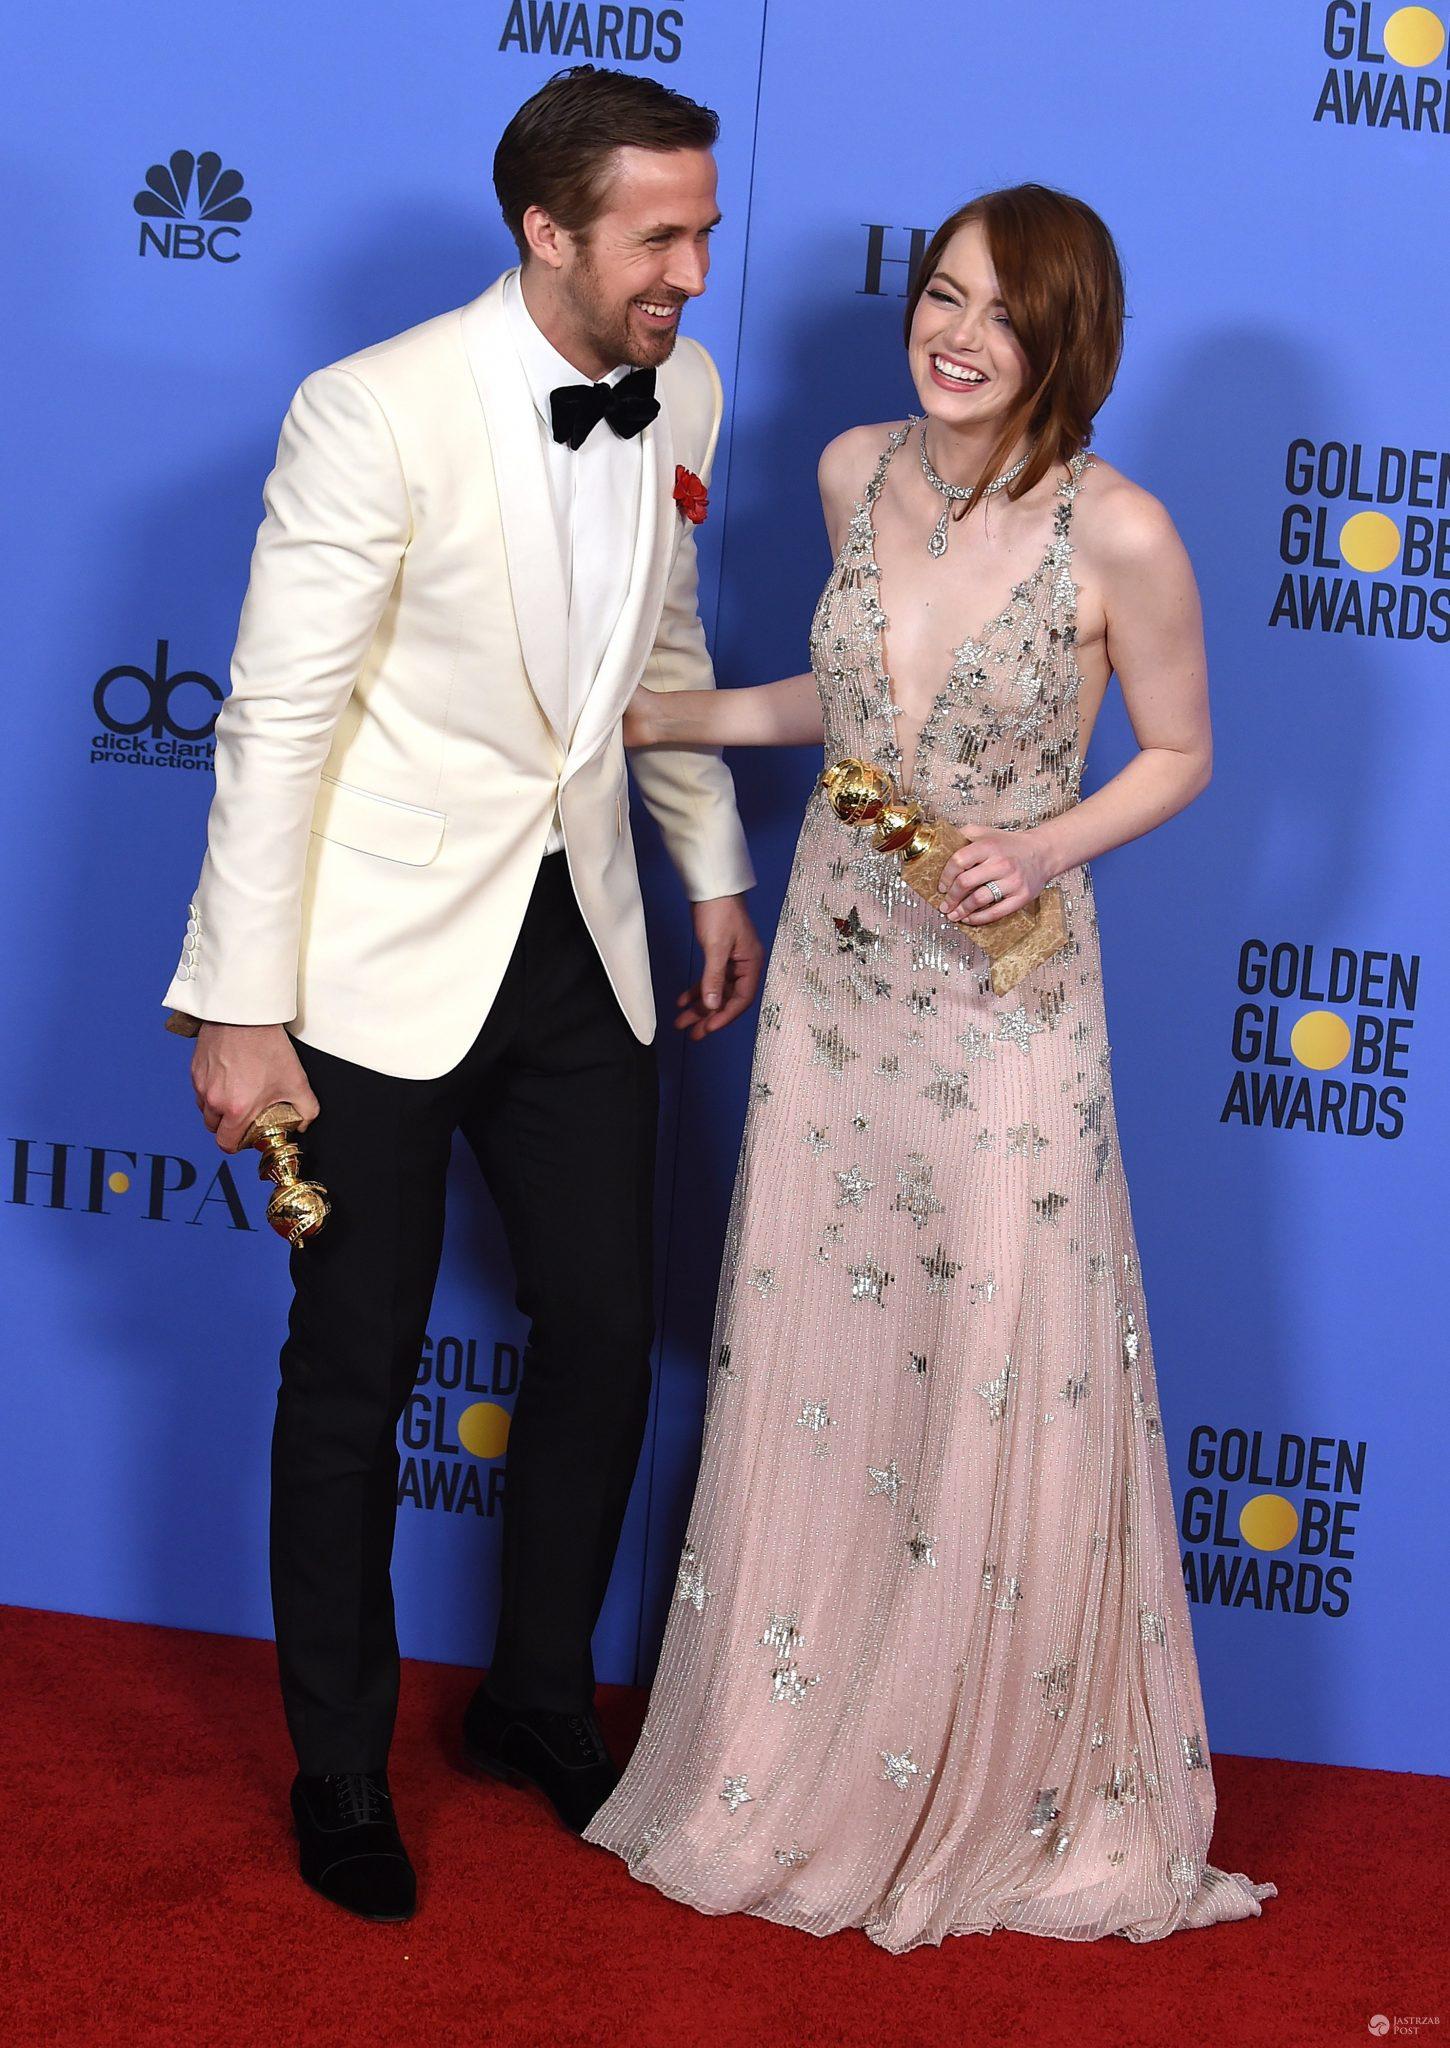 Ryan Gosling zdradził żonę Evę Mendes z Emmą Stone?